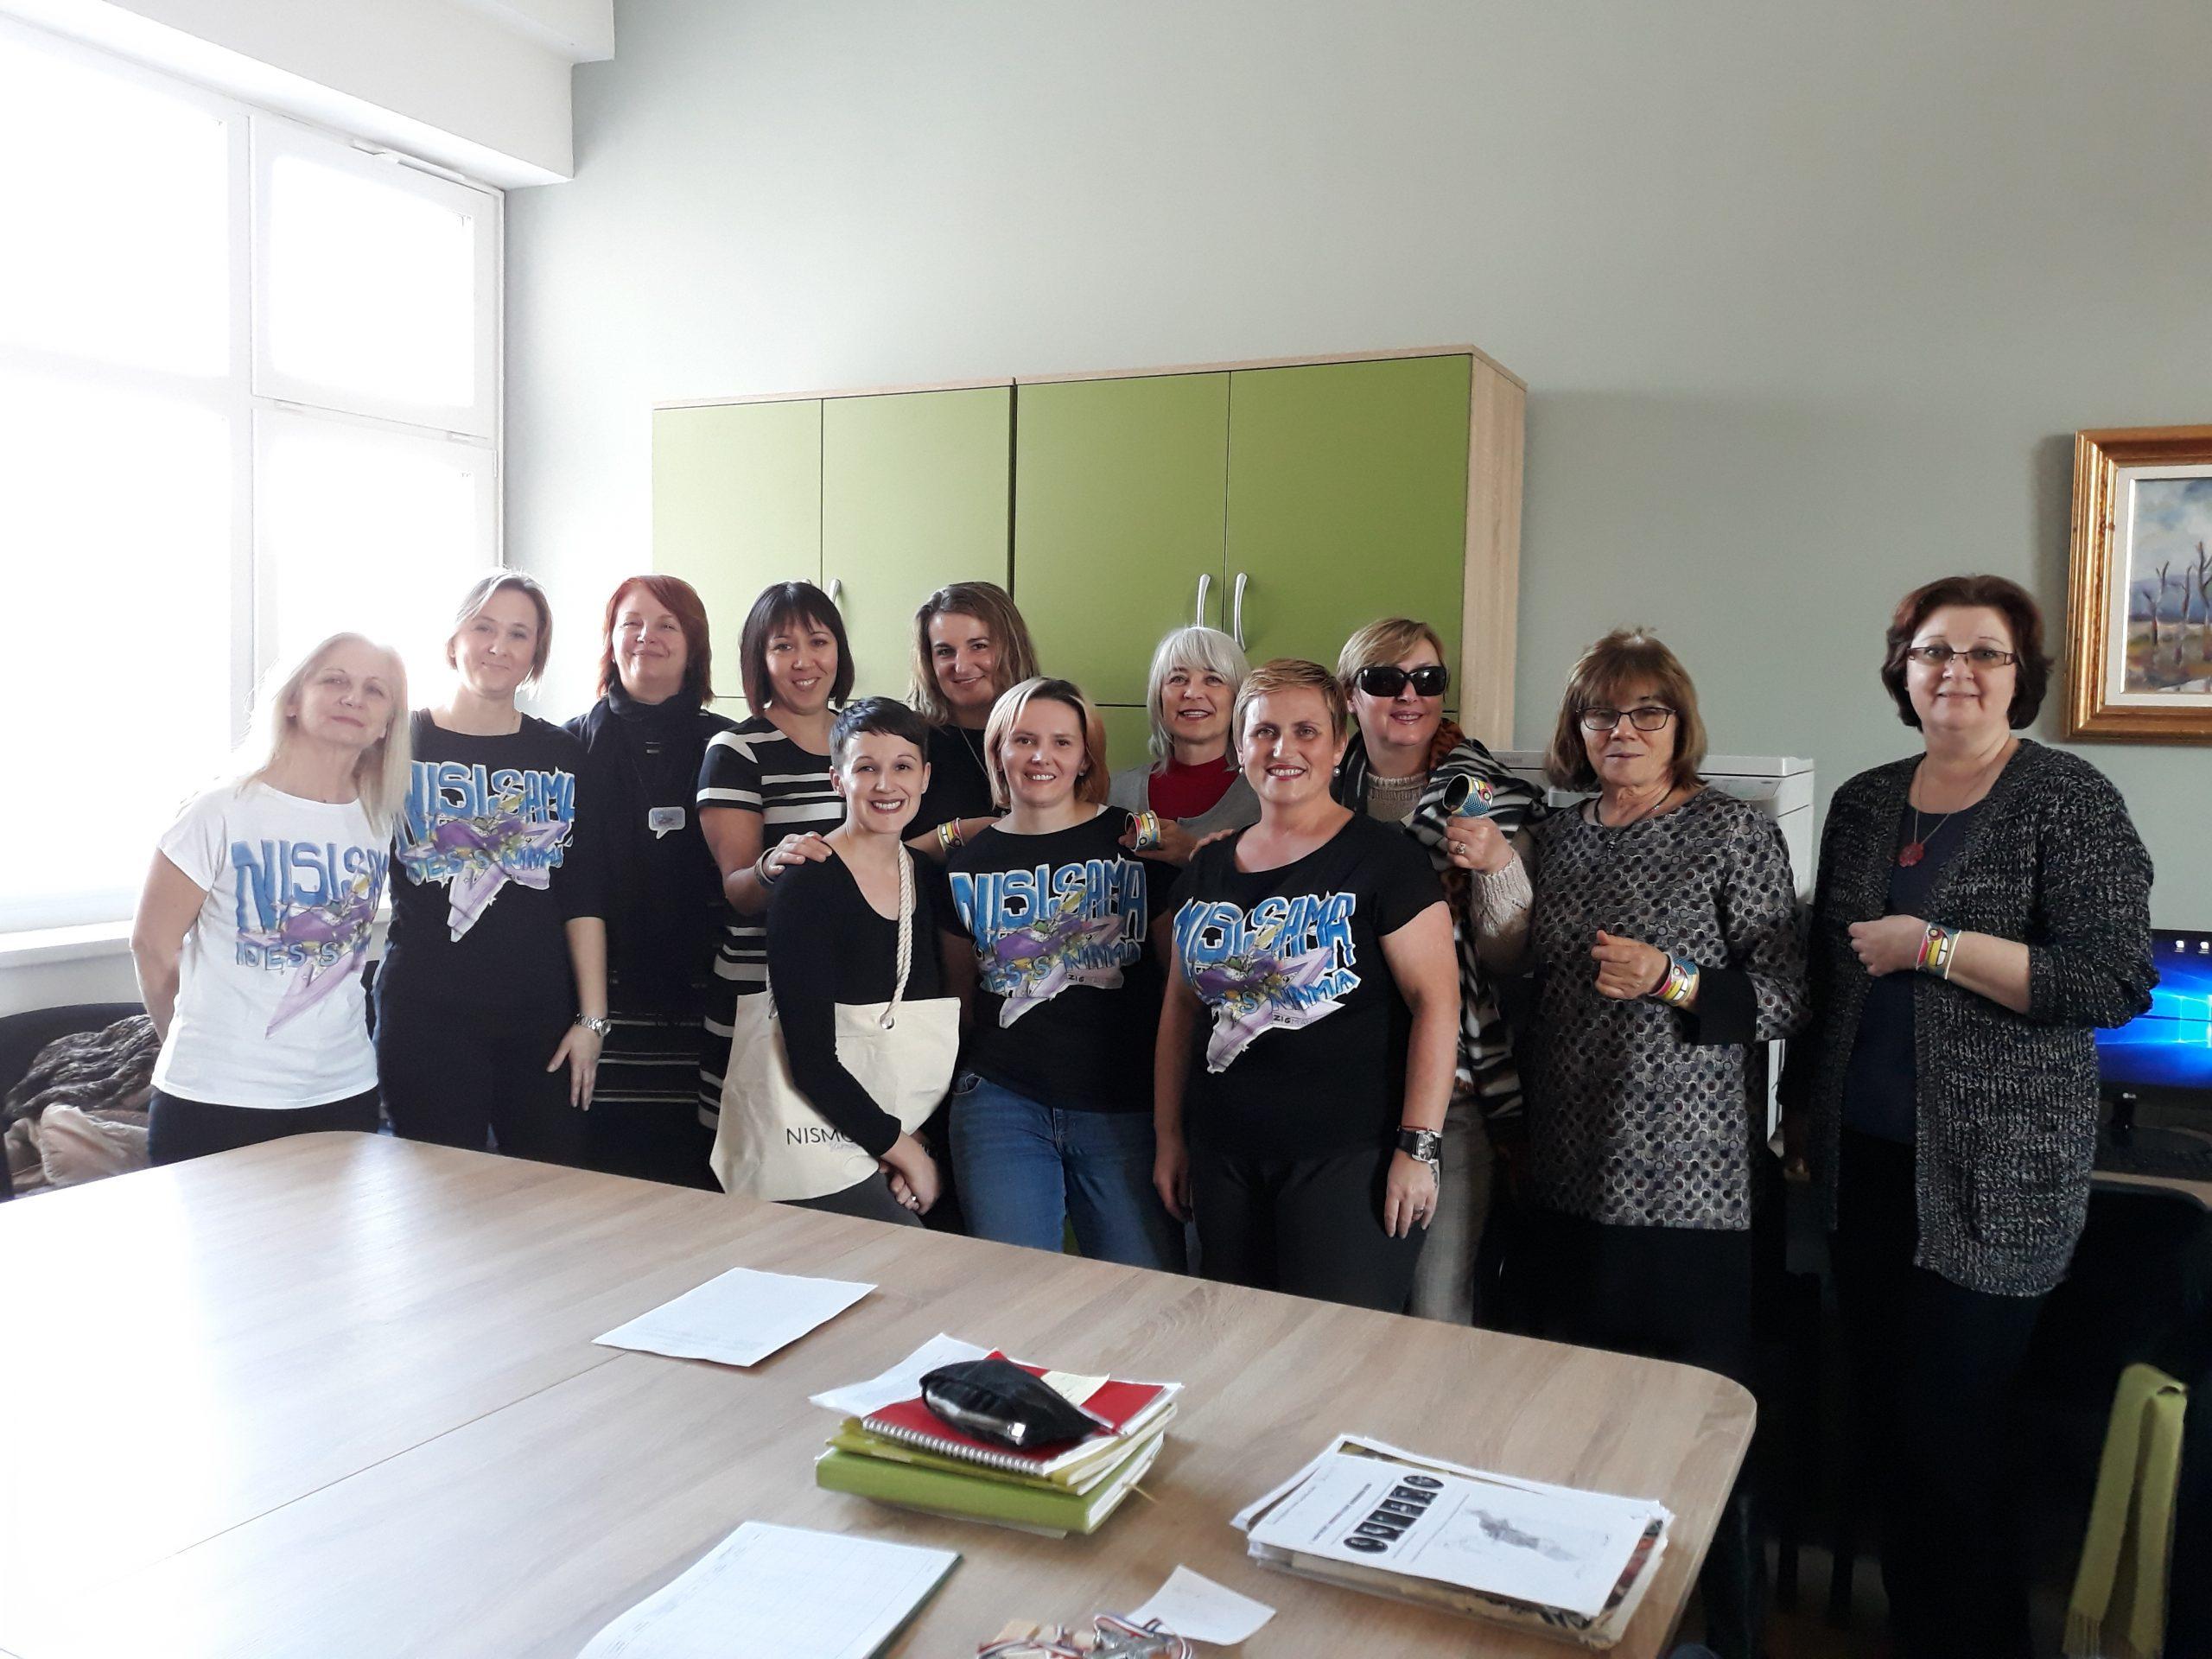 NISMO SAME Garešničanke majicama pomažu do prijevoza na kemoterapije